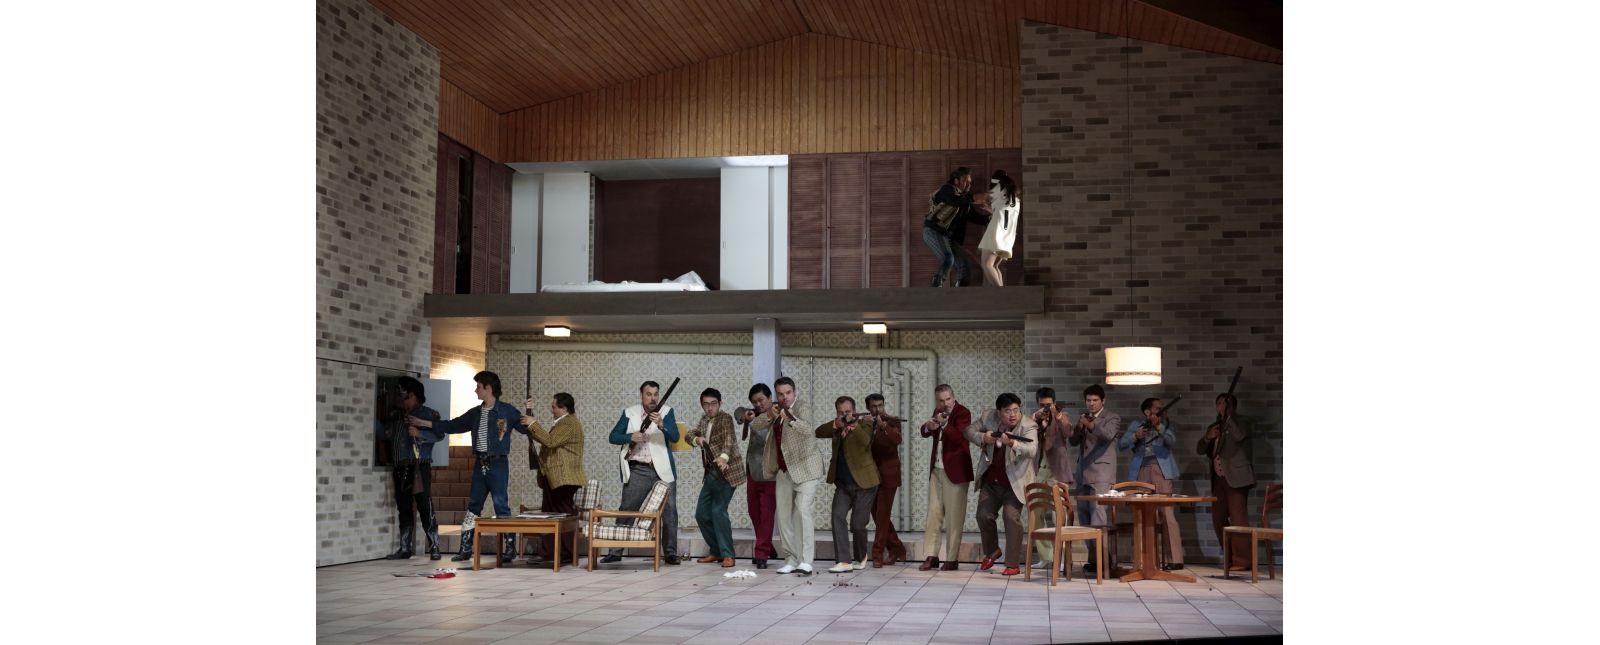 Falstaff // vorne: Junbum Lee / Rossen Krastev / Roberto Gionfriddo / Martin Berner / Opernchor des Theater Freiburg // hinten: Juan Orozco / Irina Jae-Eun Park // 2019 // Paul Leclaire